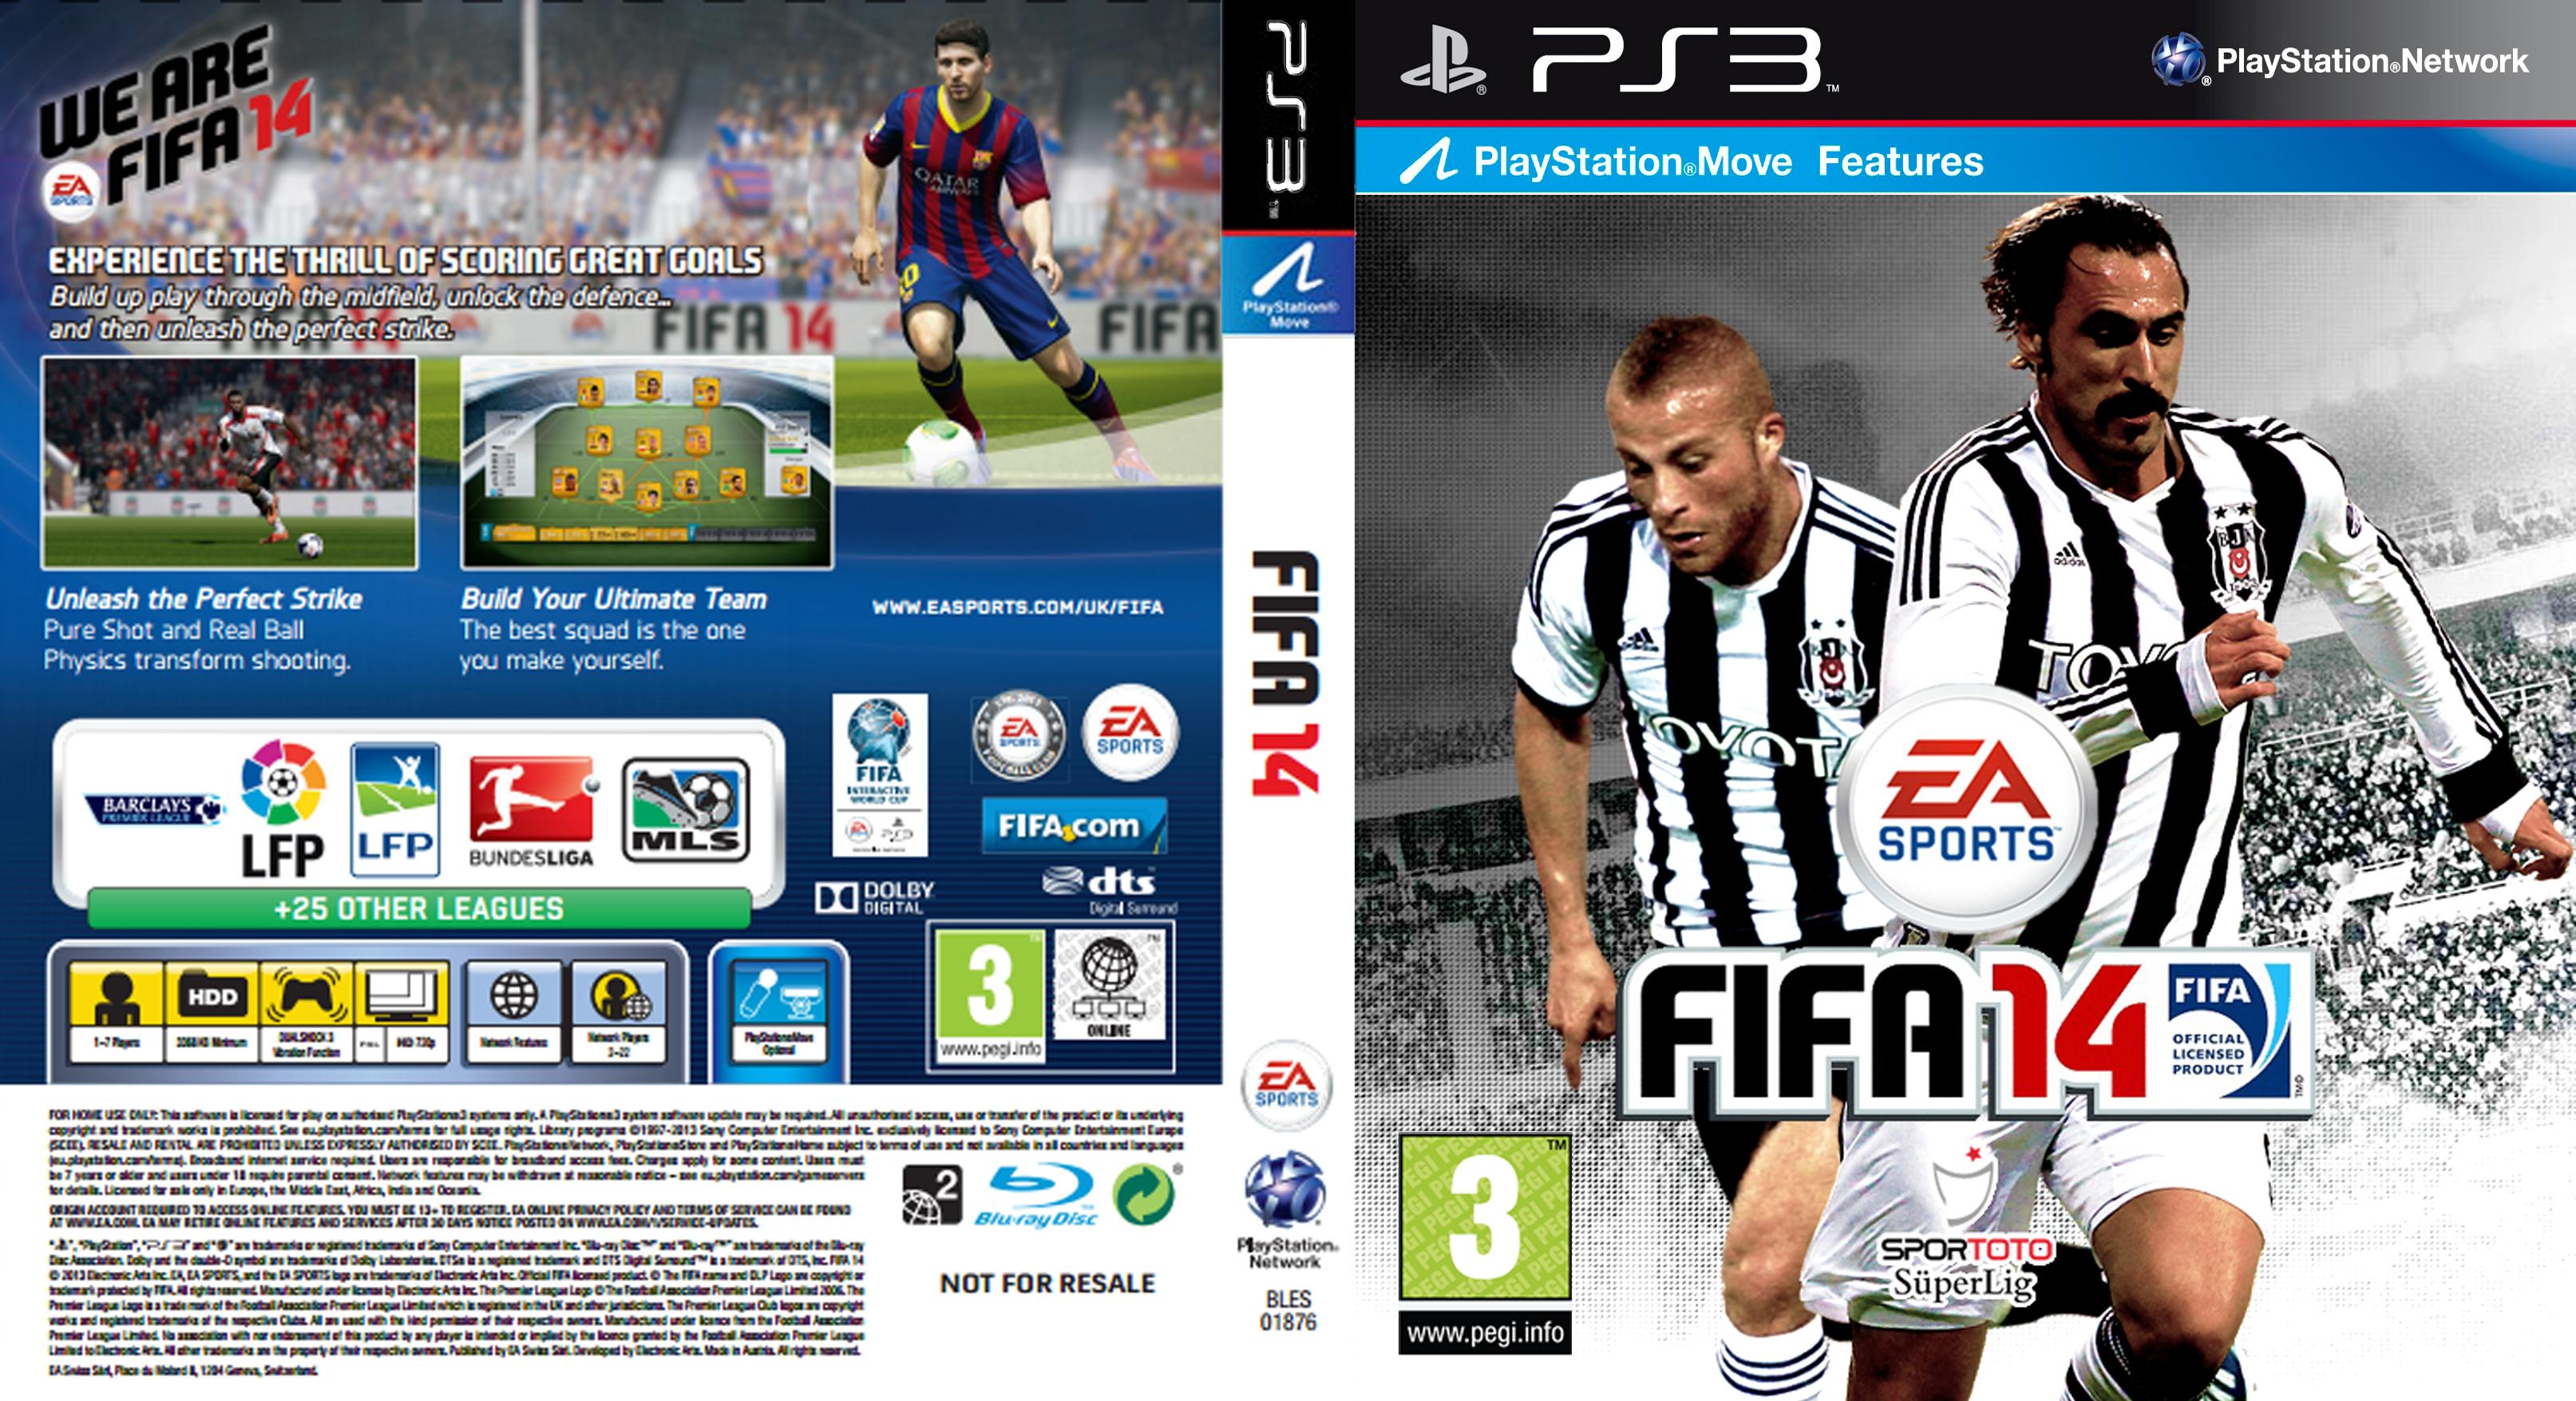 Fifa 14 ps3 box